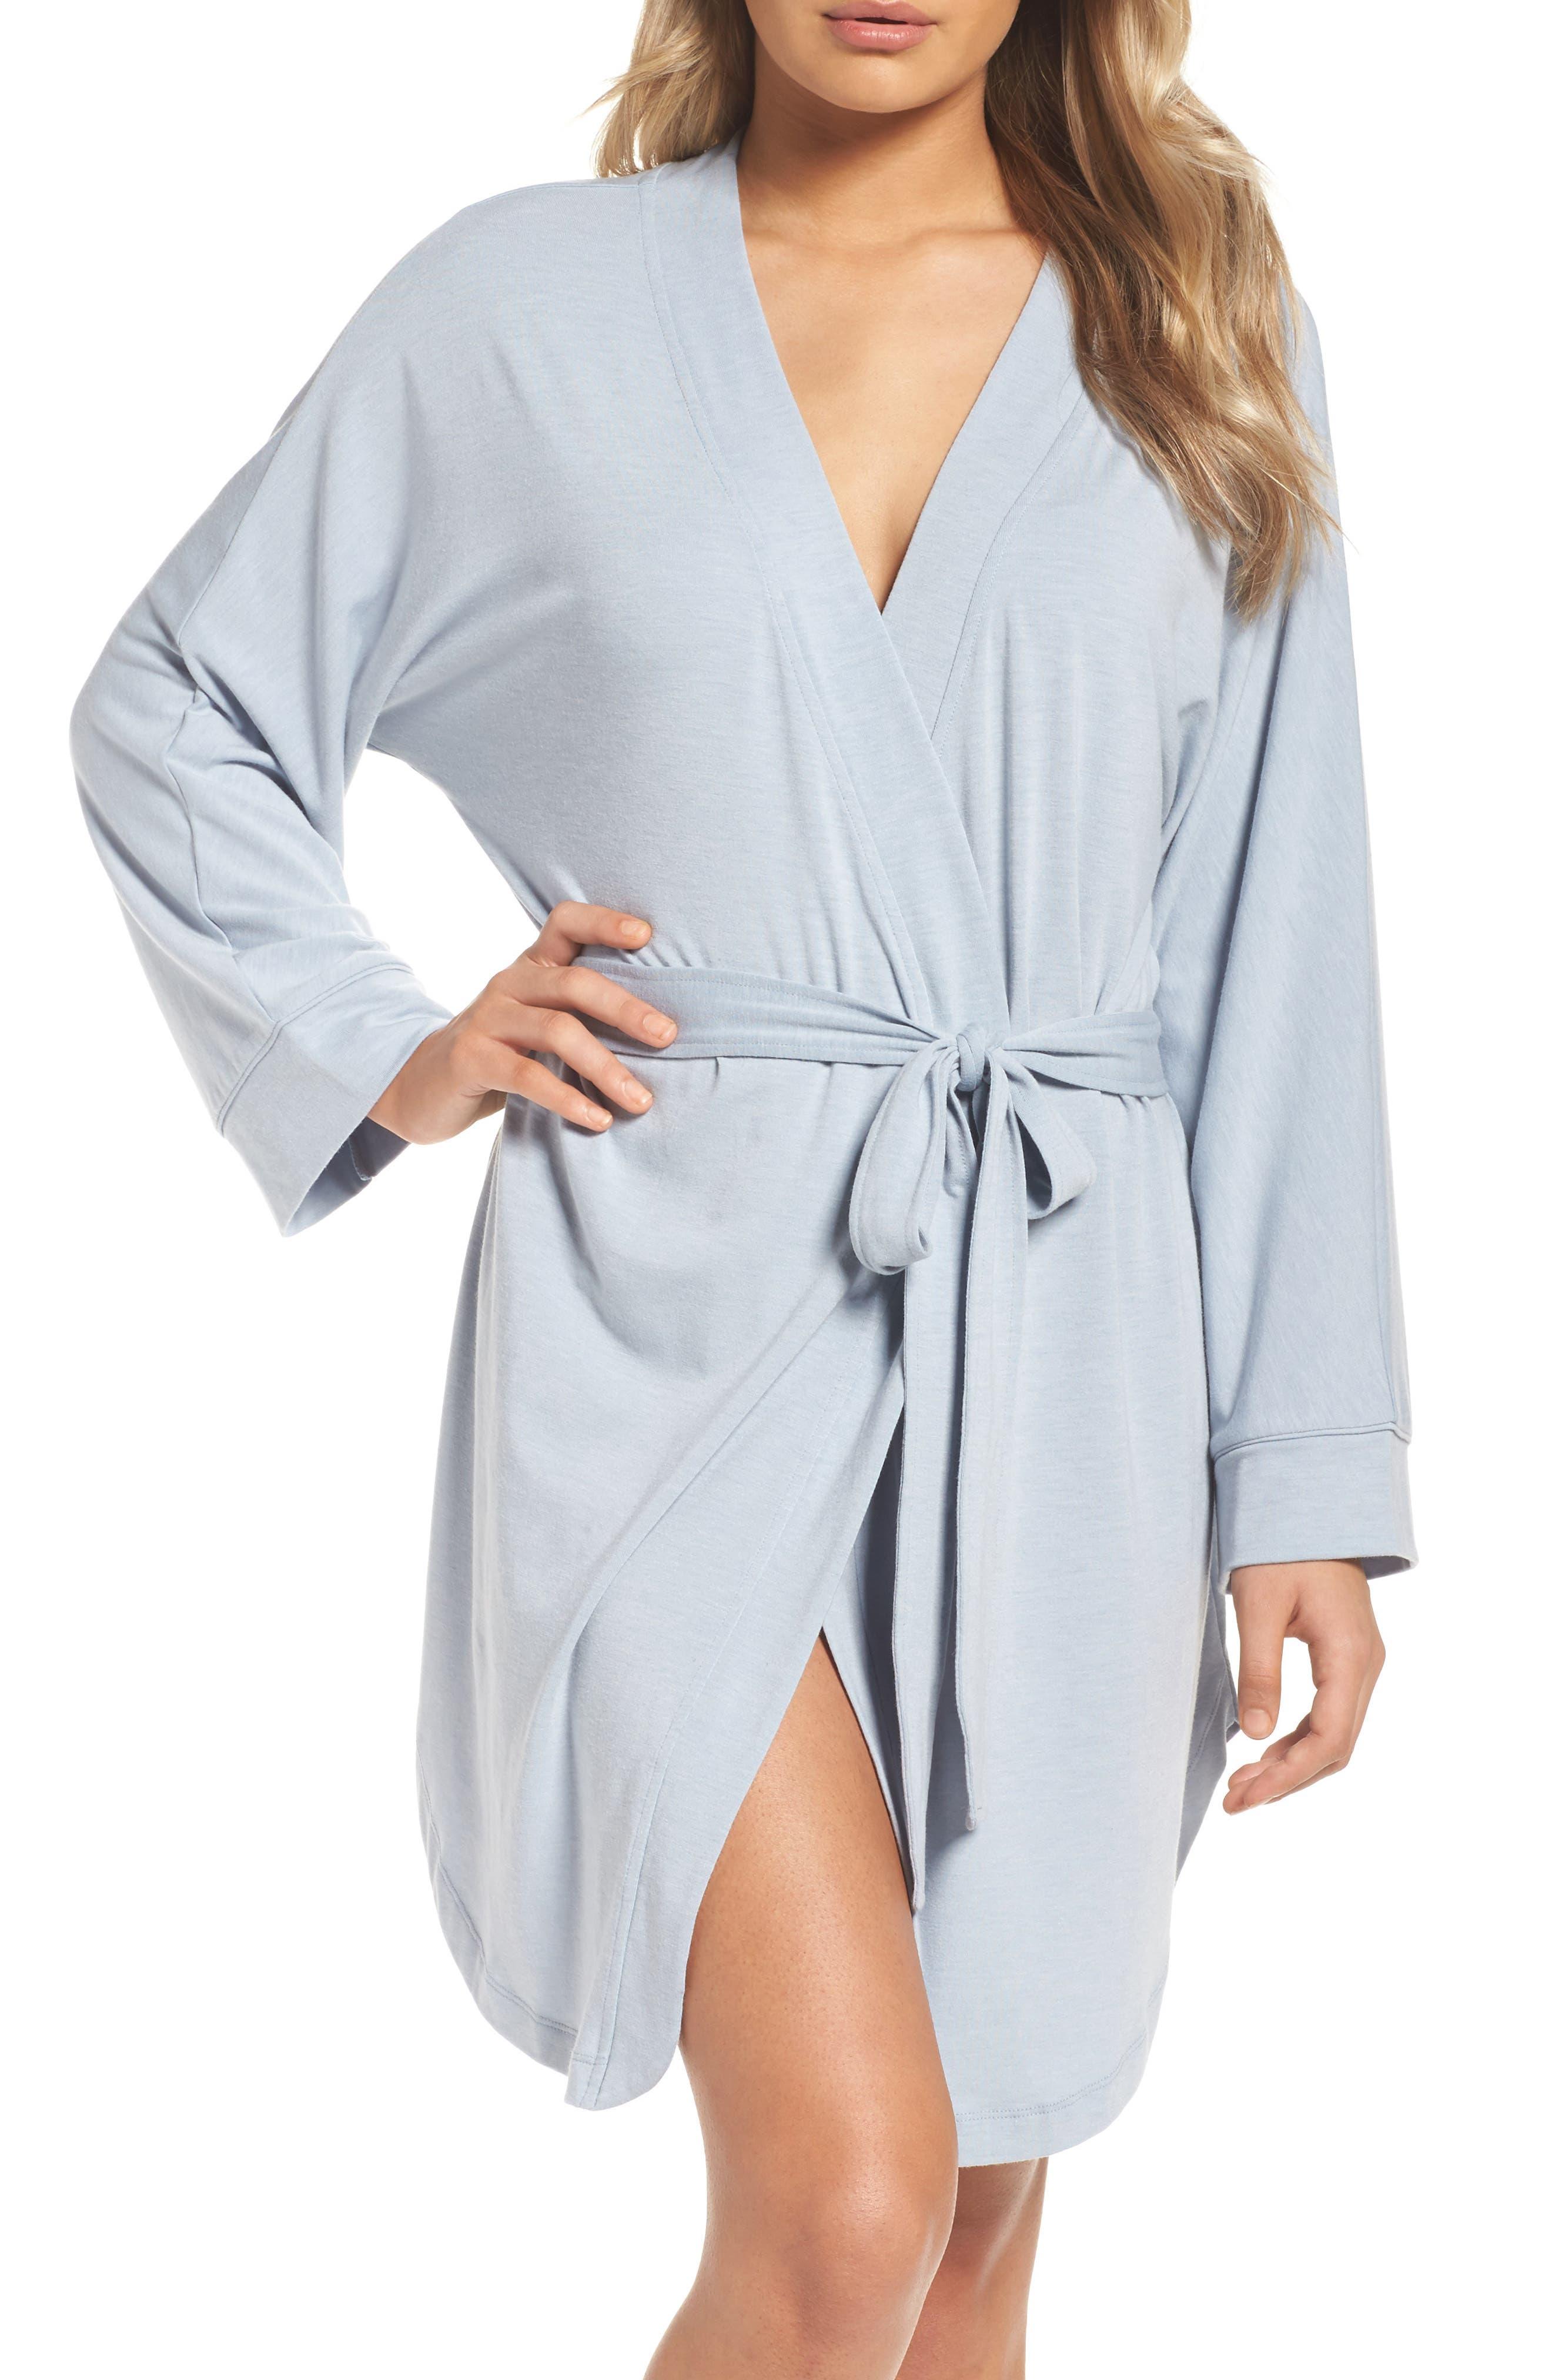 Main Image - Honeydew Intimates Jersey Robe (2 for $60)